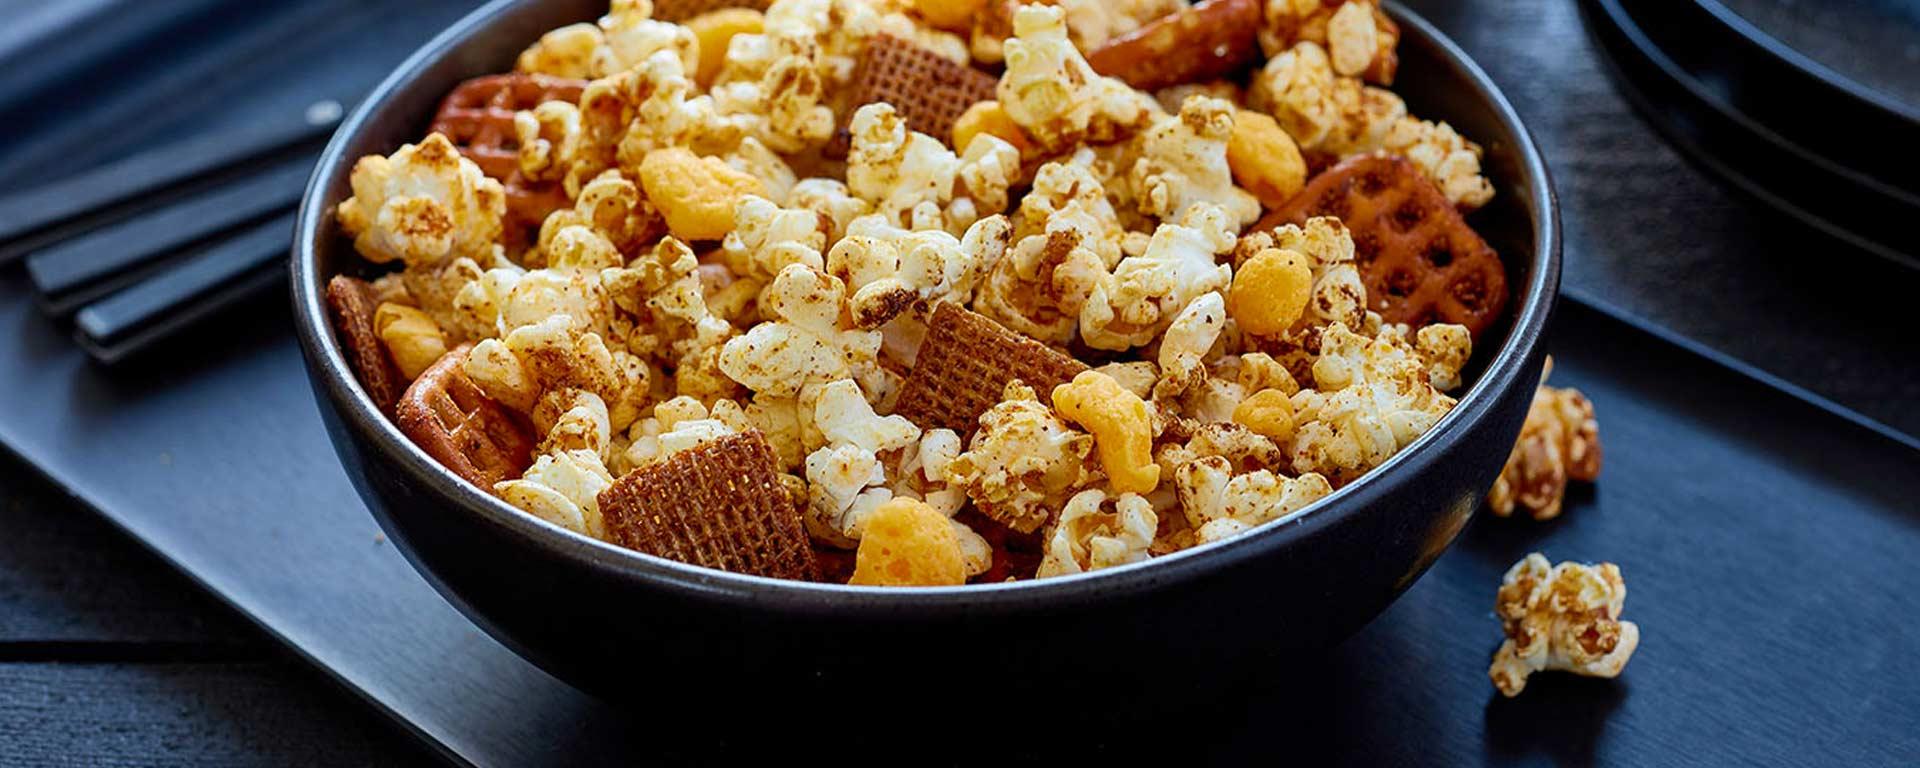 Photo for - Crunchy Cheddar Popcorn Mix